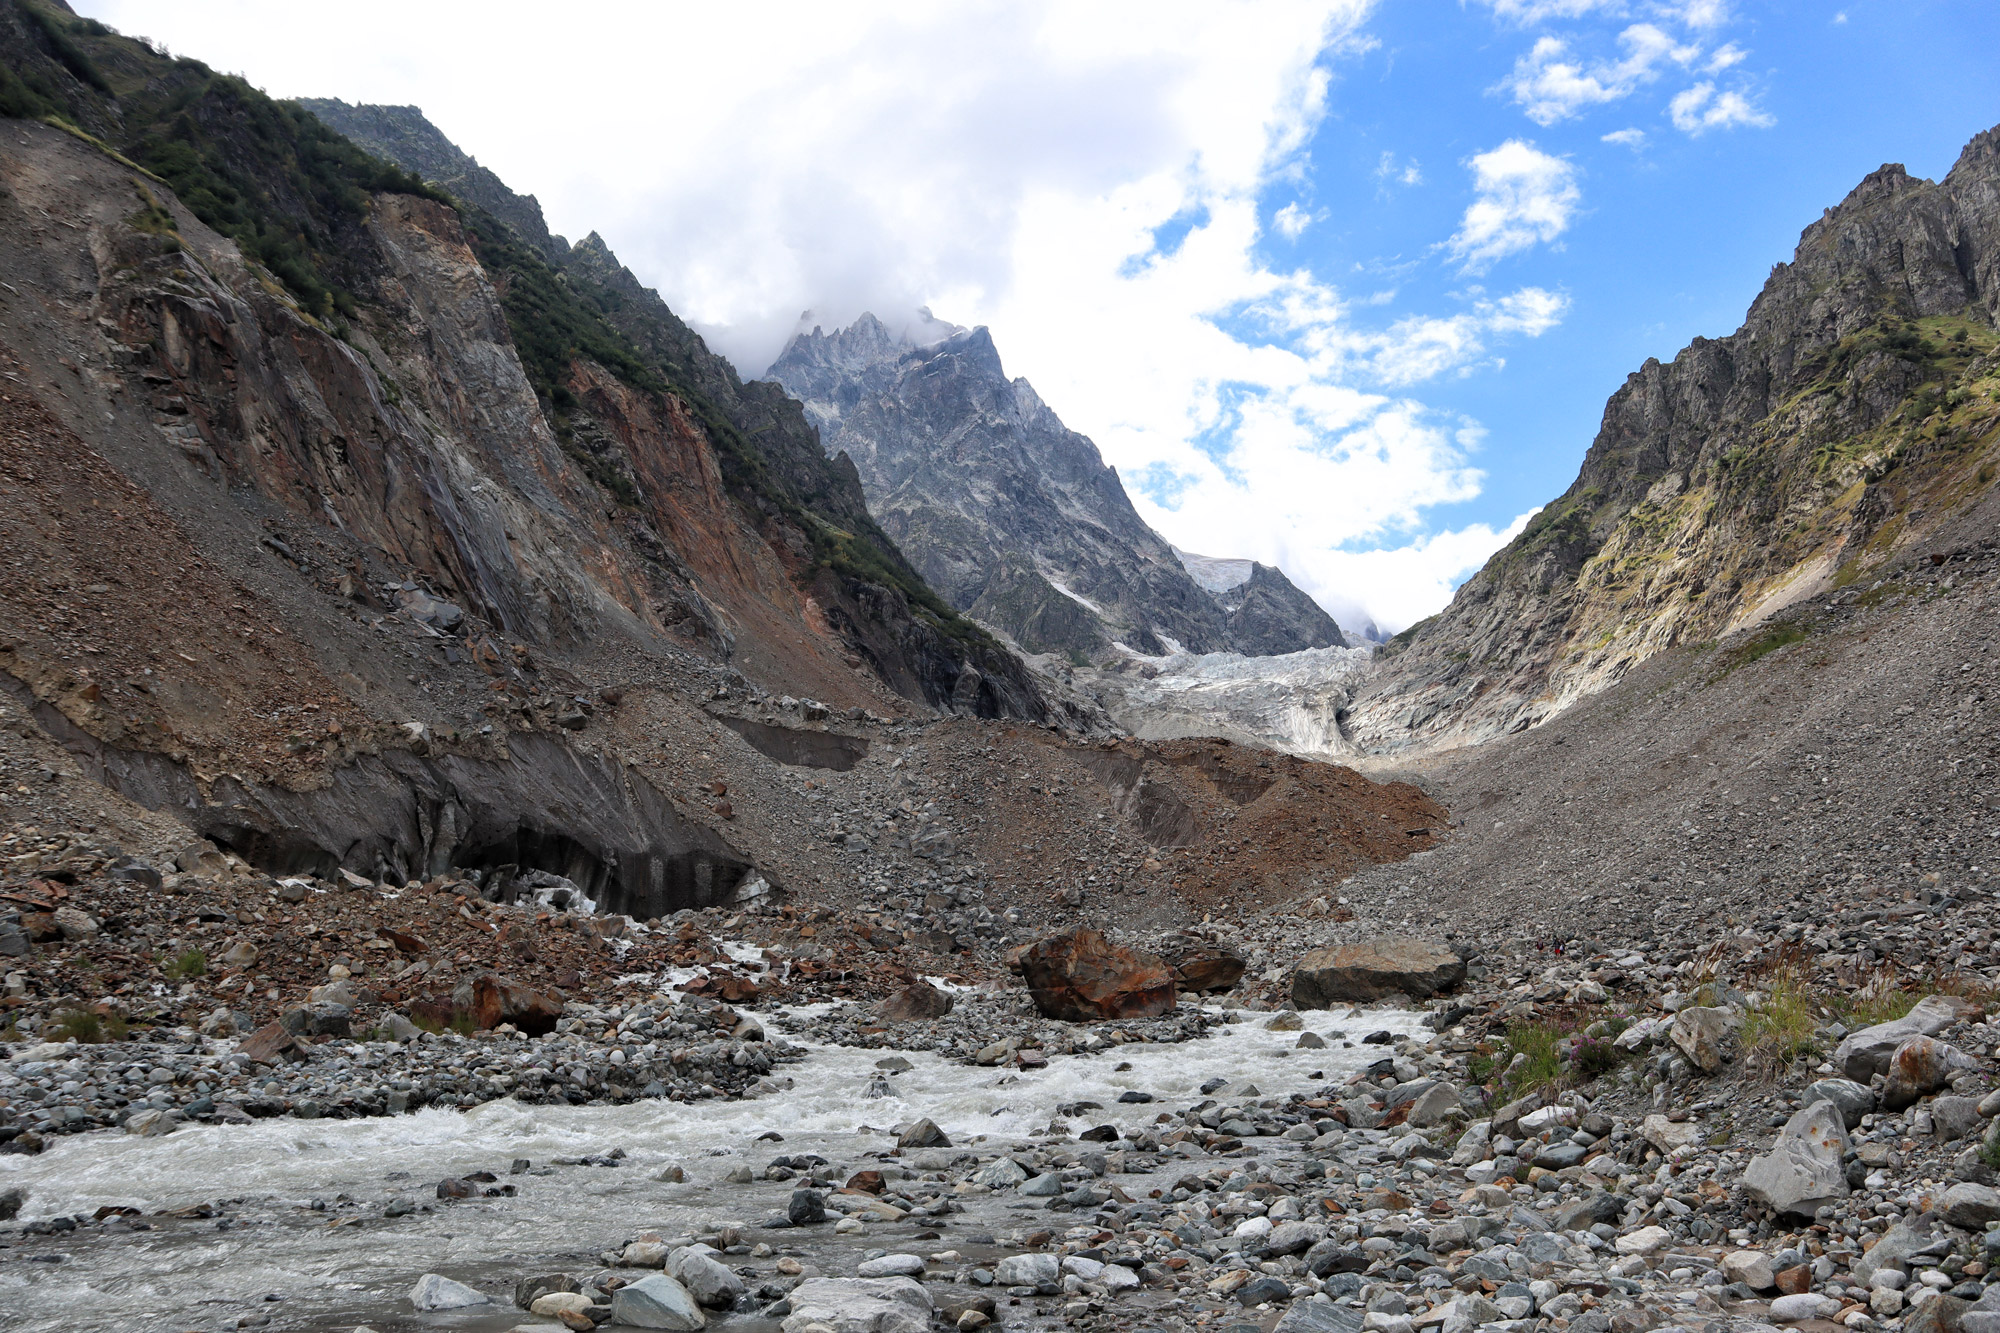 Georgië reisverslag - Wandelen naar de Chalaadi Gletsjer